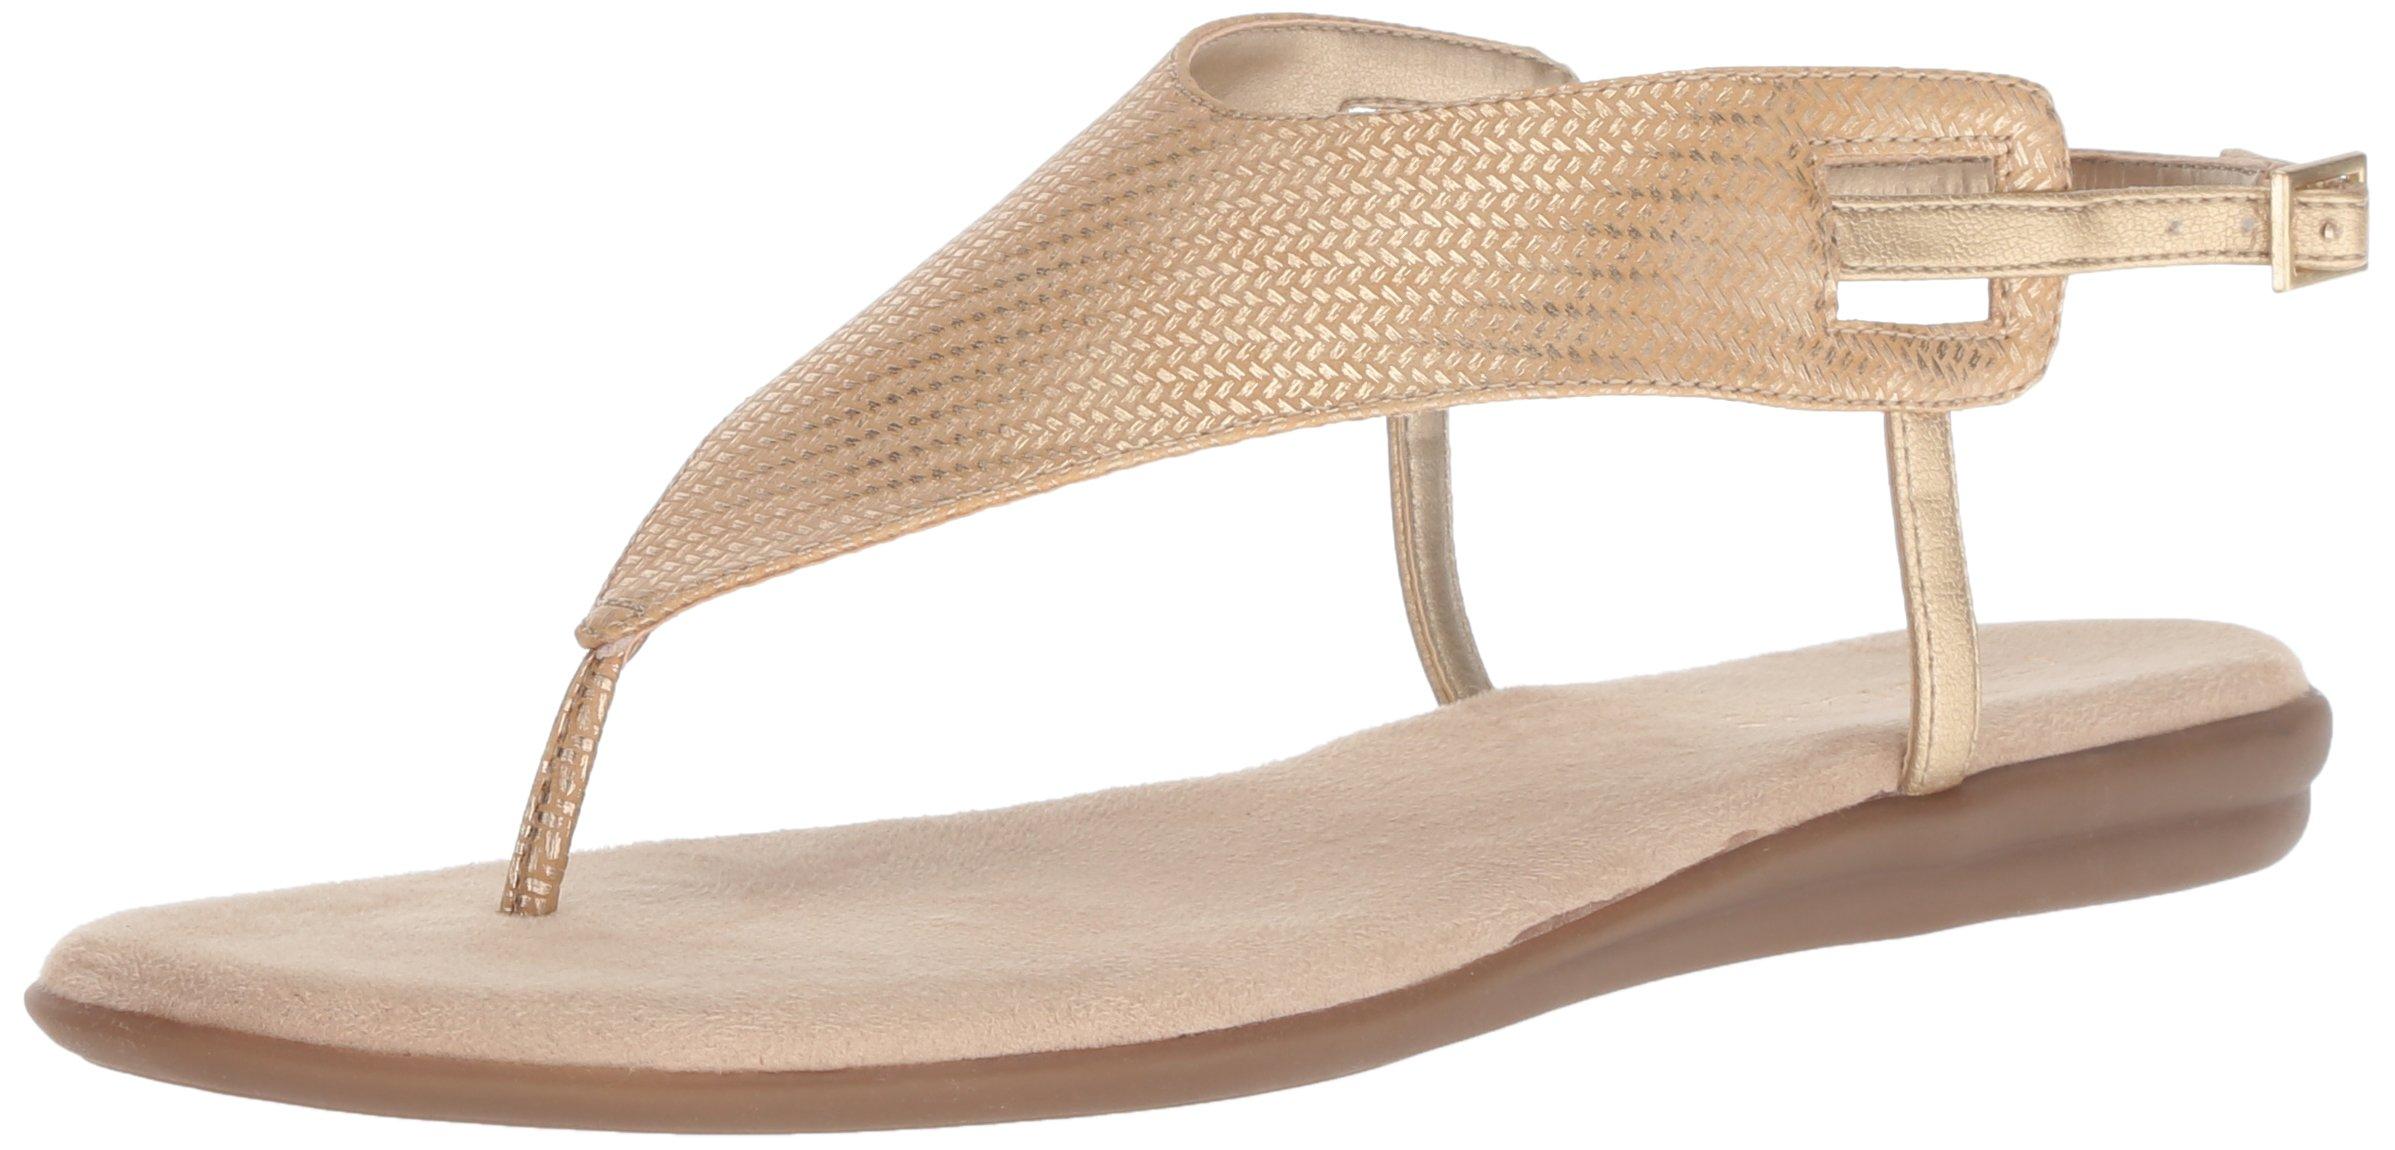 Aerosoles Women's Chlose Friend Sandal, Gold, 8.5 M US